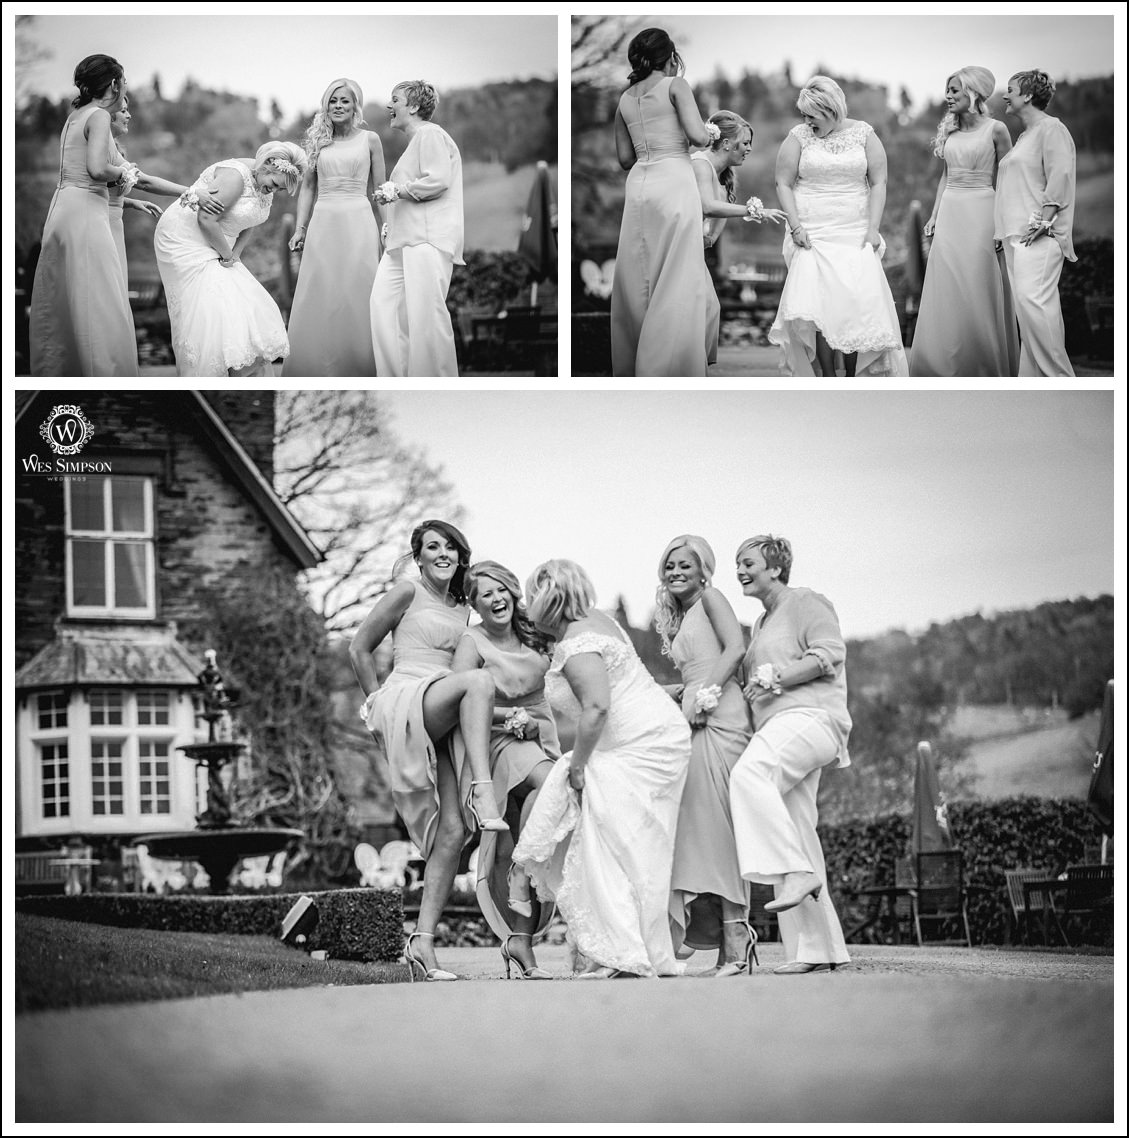 Broadoaks wedding venue, Lake District wedding photographer, Windermere, Wes Simpson photography_0050